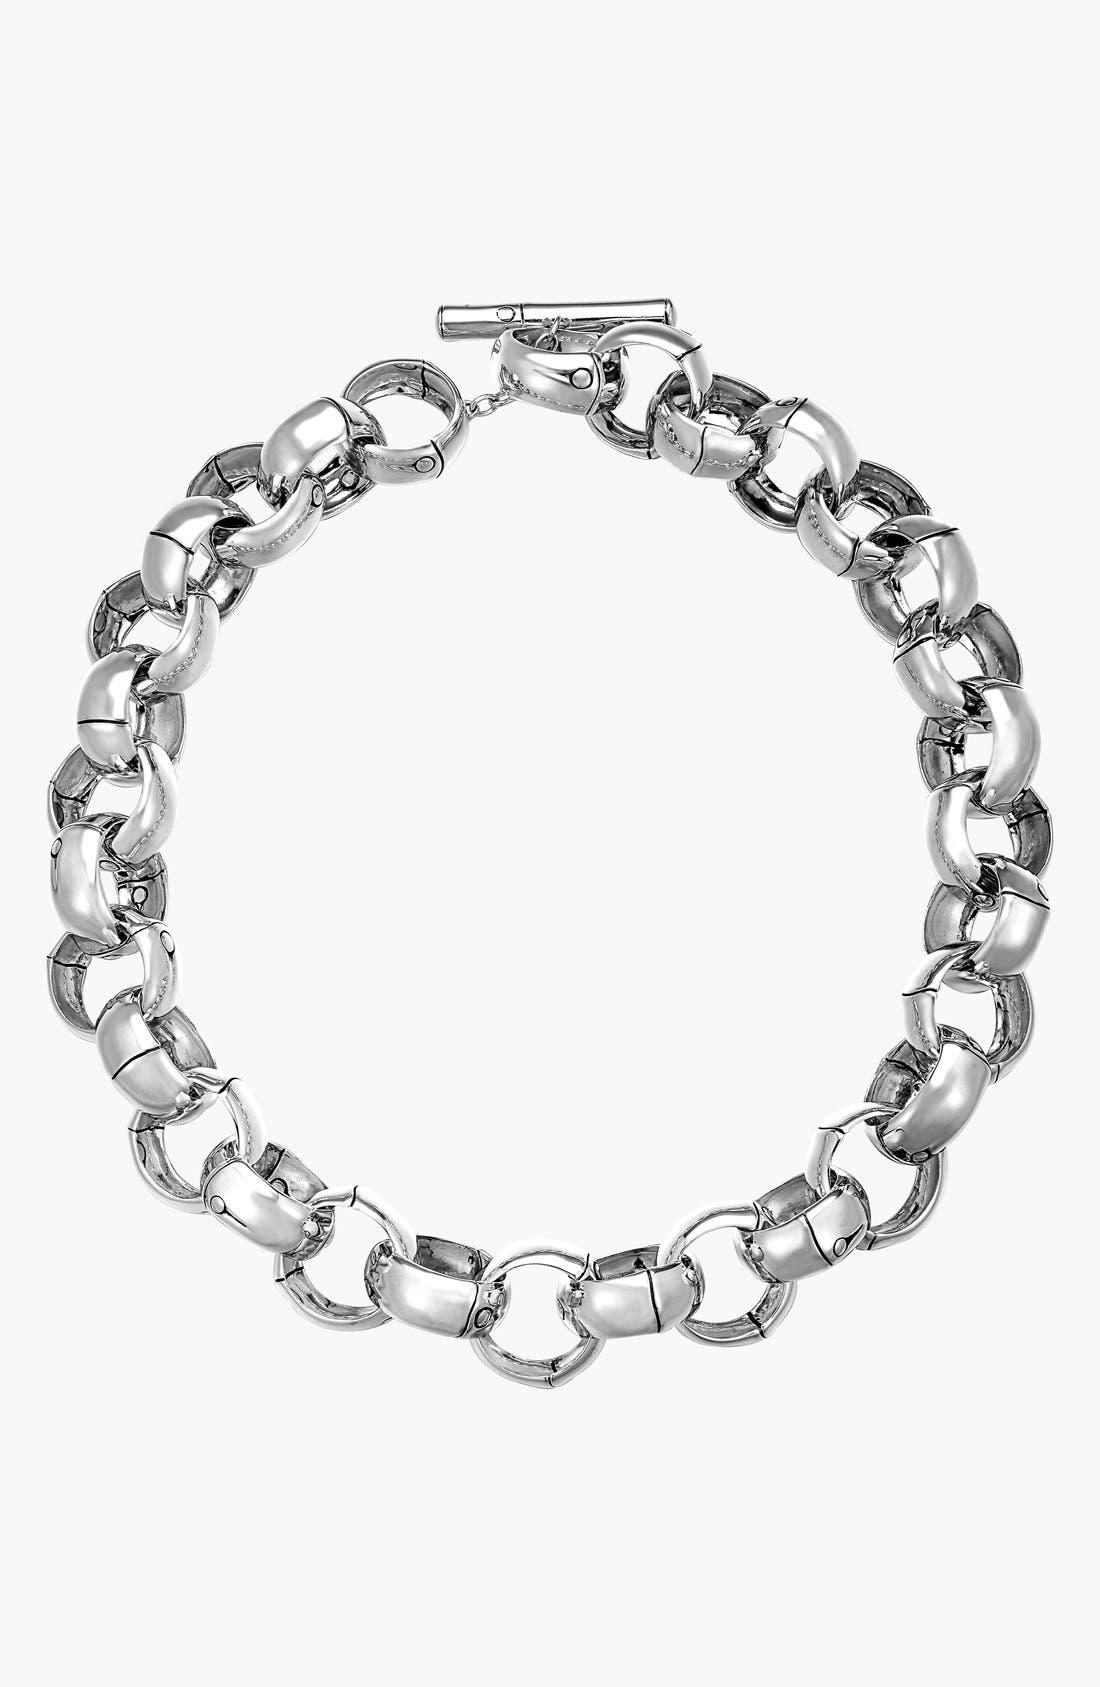 Main Image - John Hardy 'Bamboo' Link Necklace